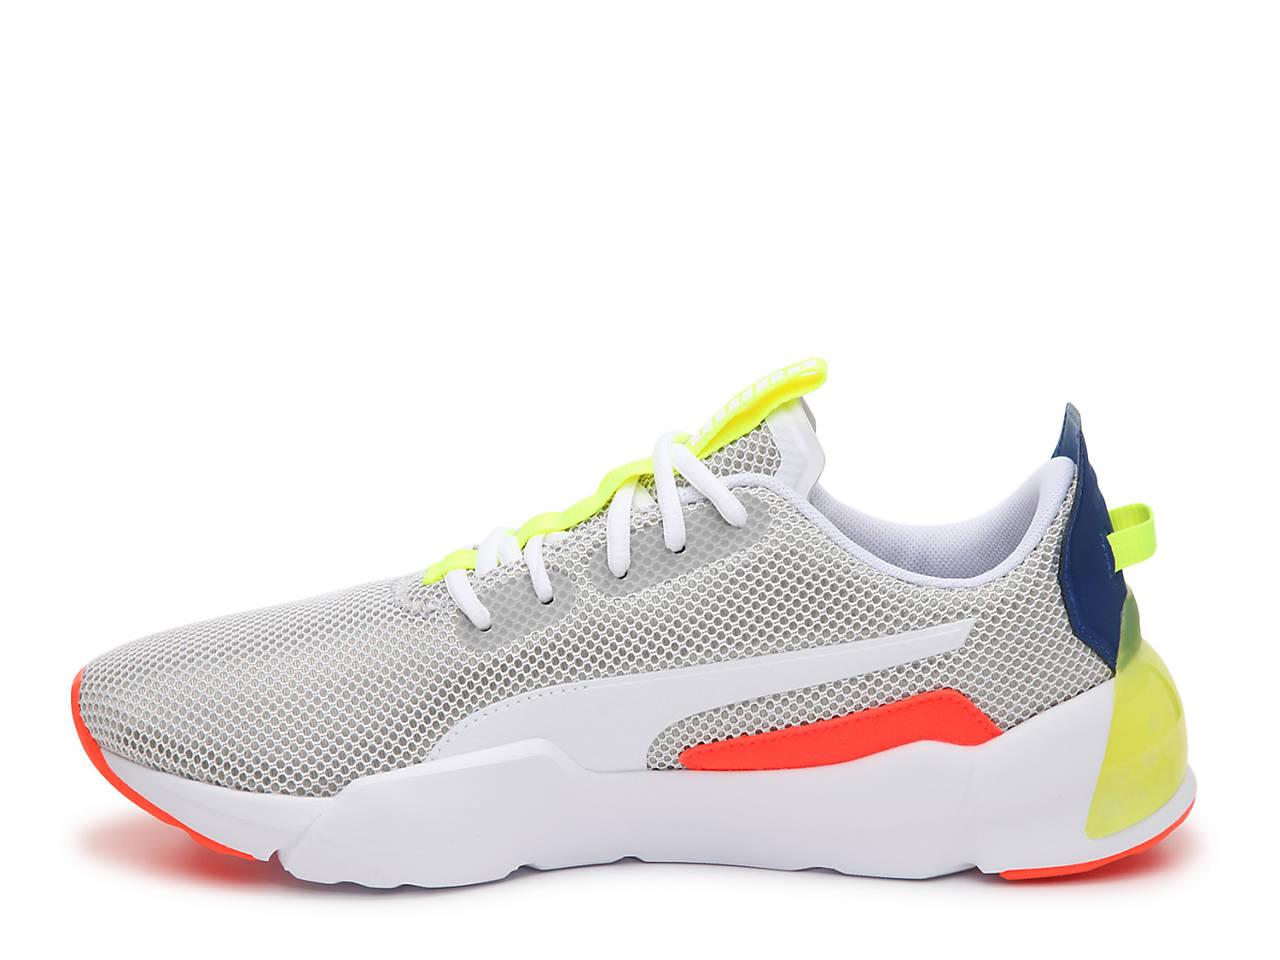 Puma Cell Phase Sneaker Men's Men's Shoes DSW  DSW